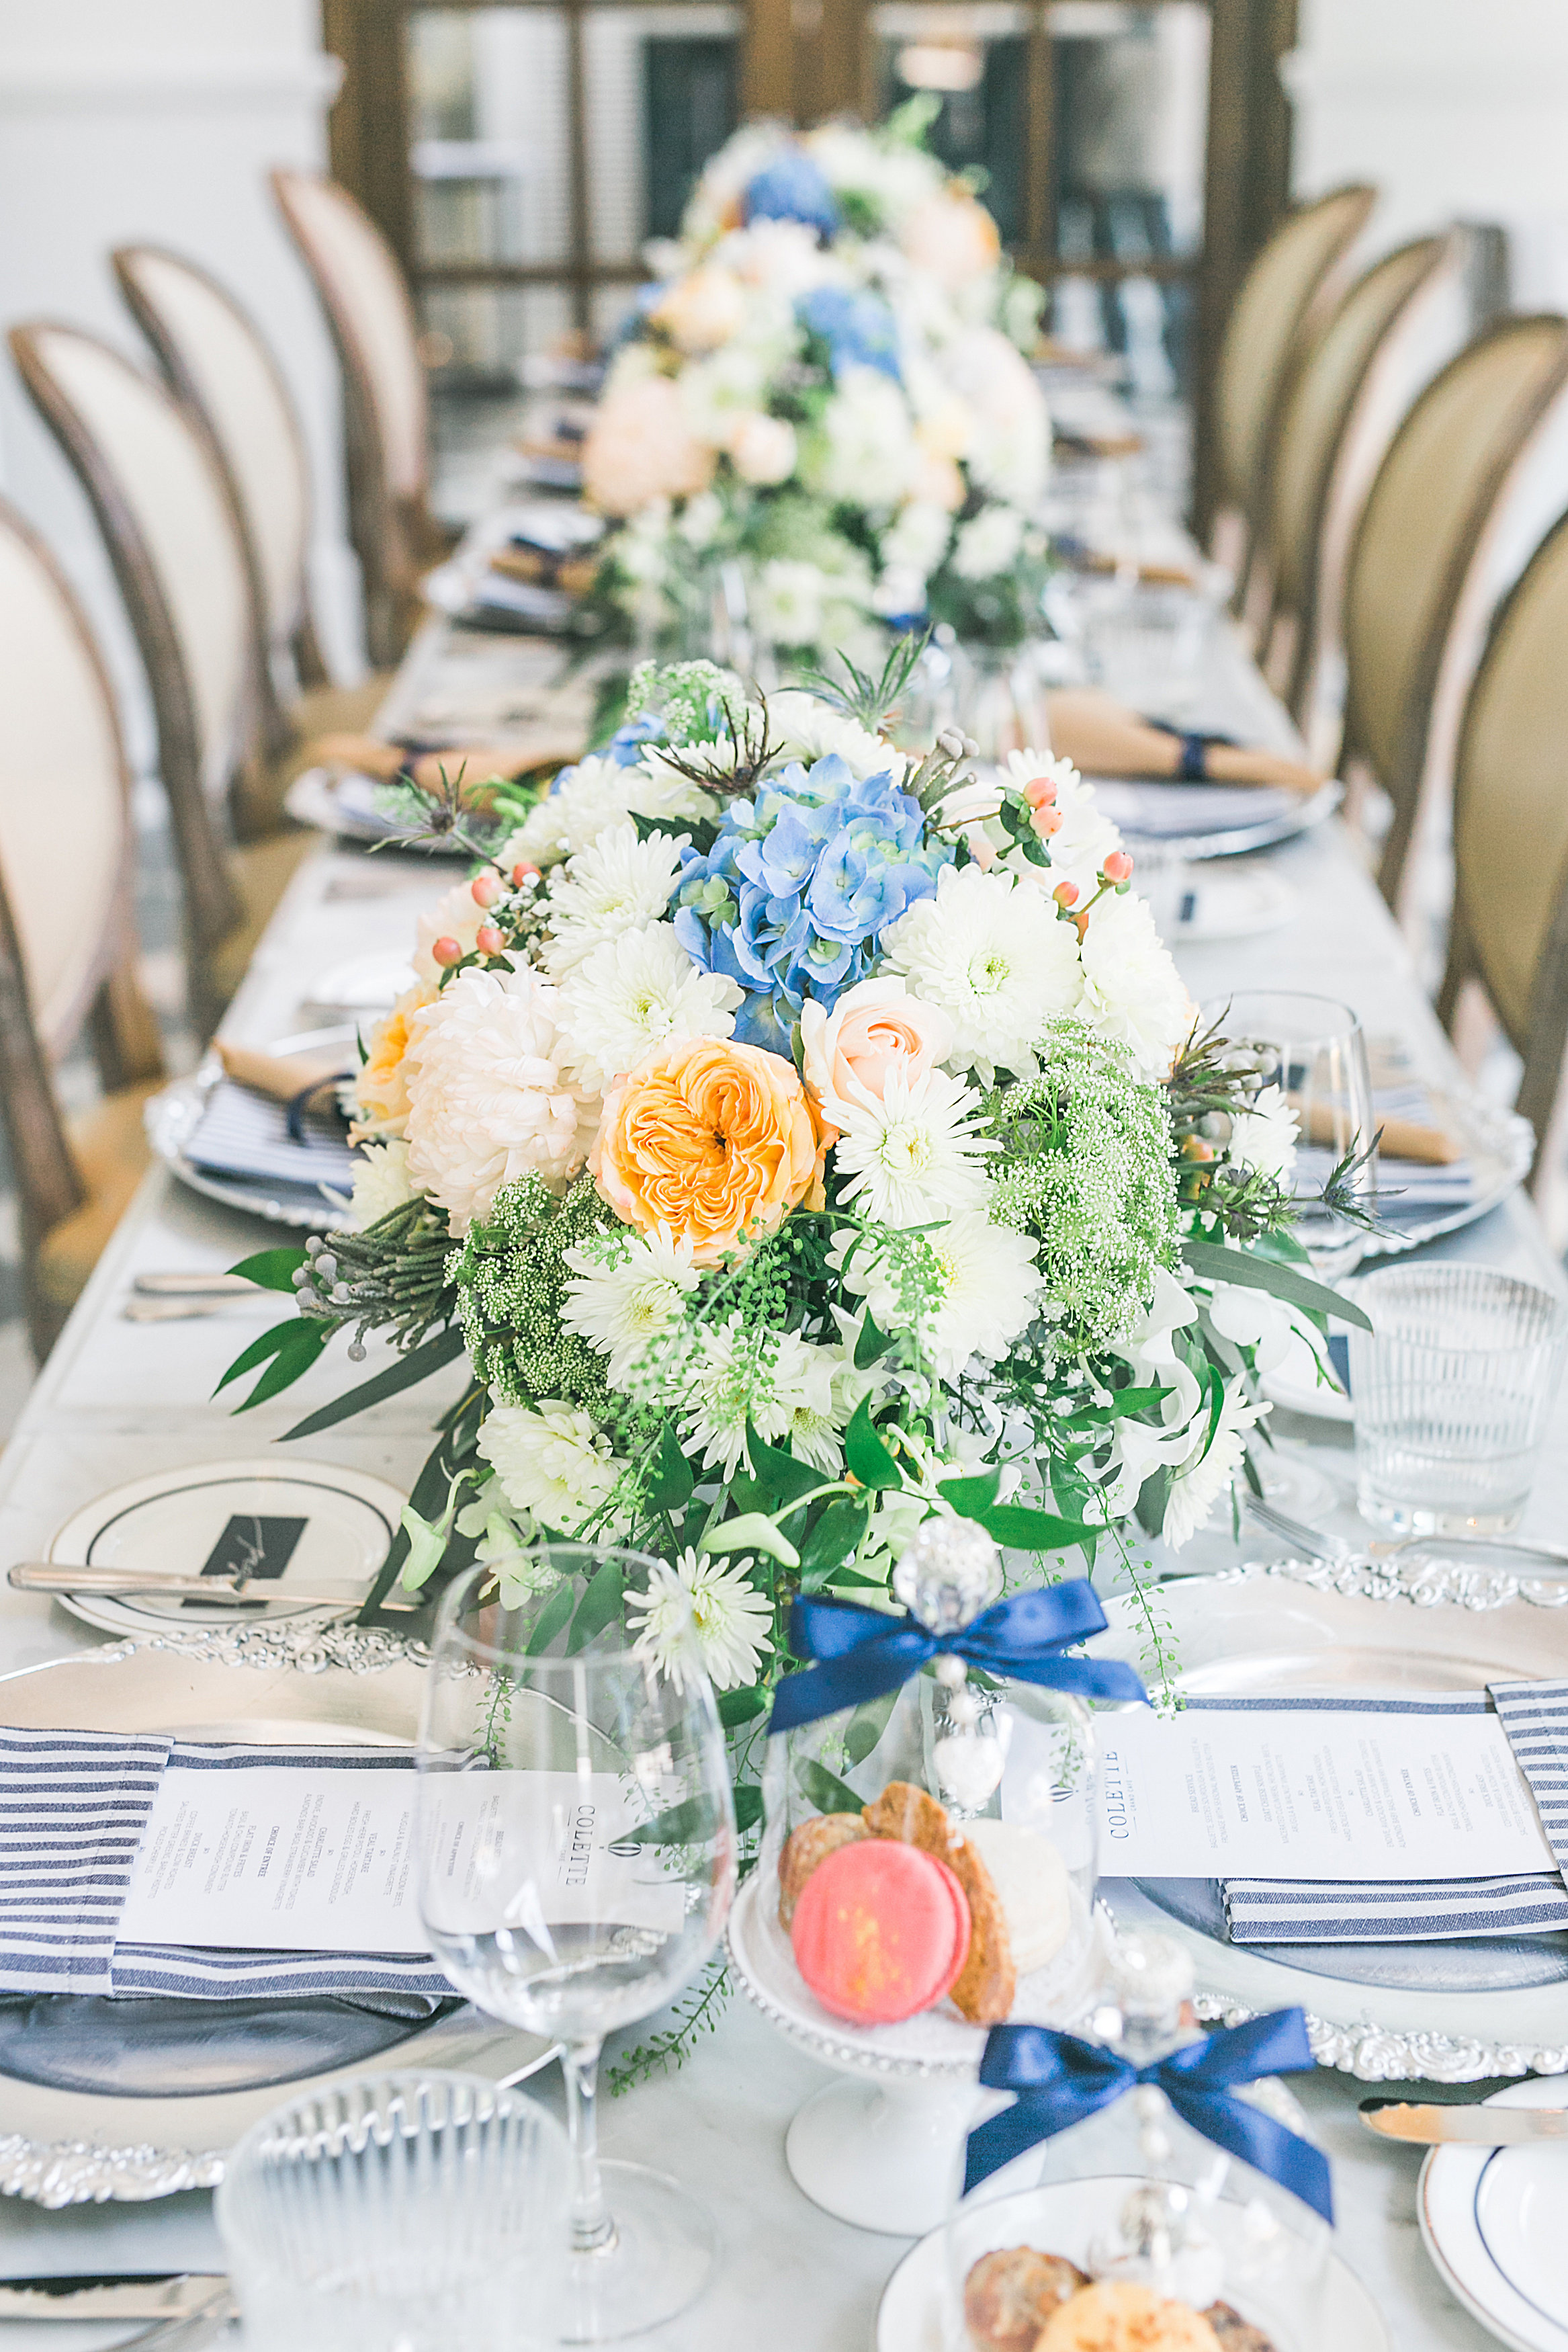 Phoebe Lo Events Toronto Wedding - Colette Cafe The Chase Hospitality Group Parisian Bridal Shower 002.jpg